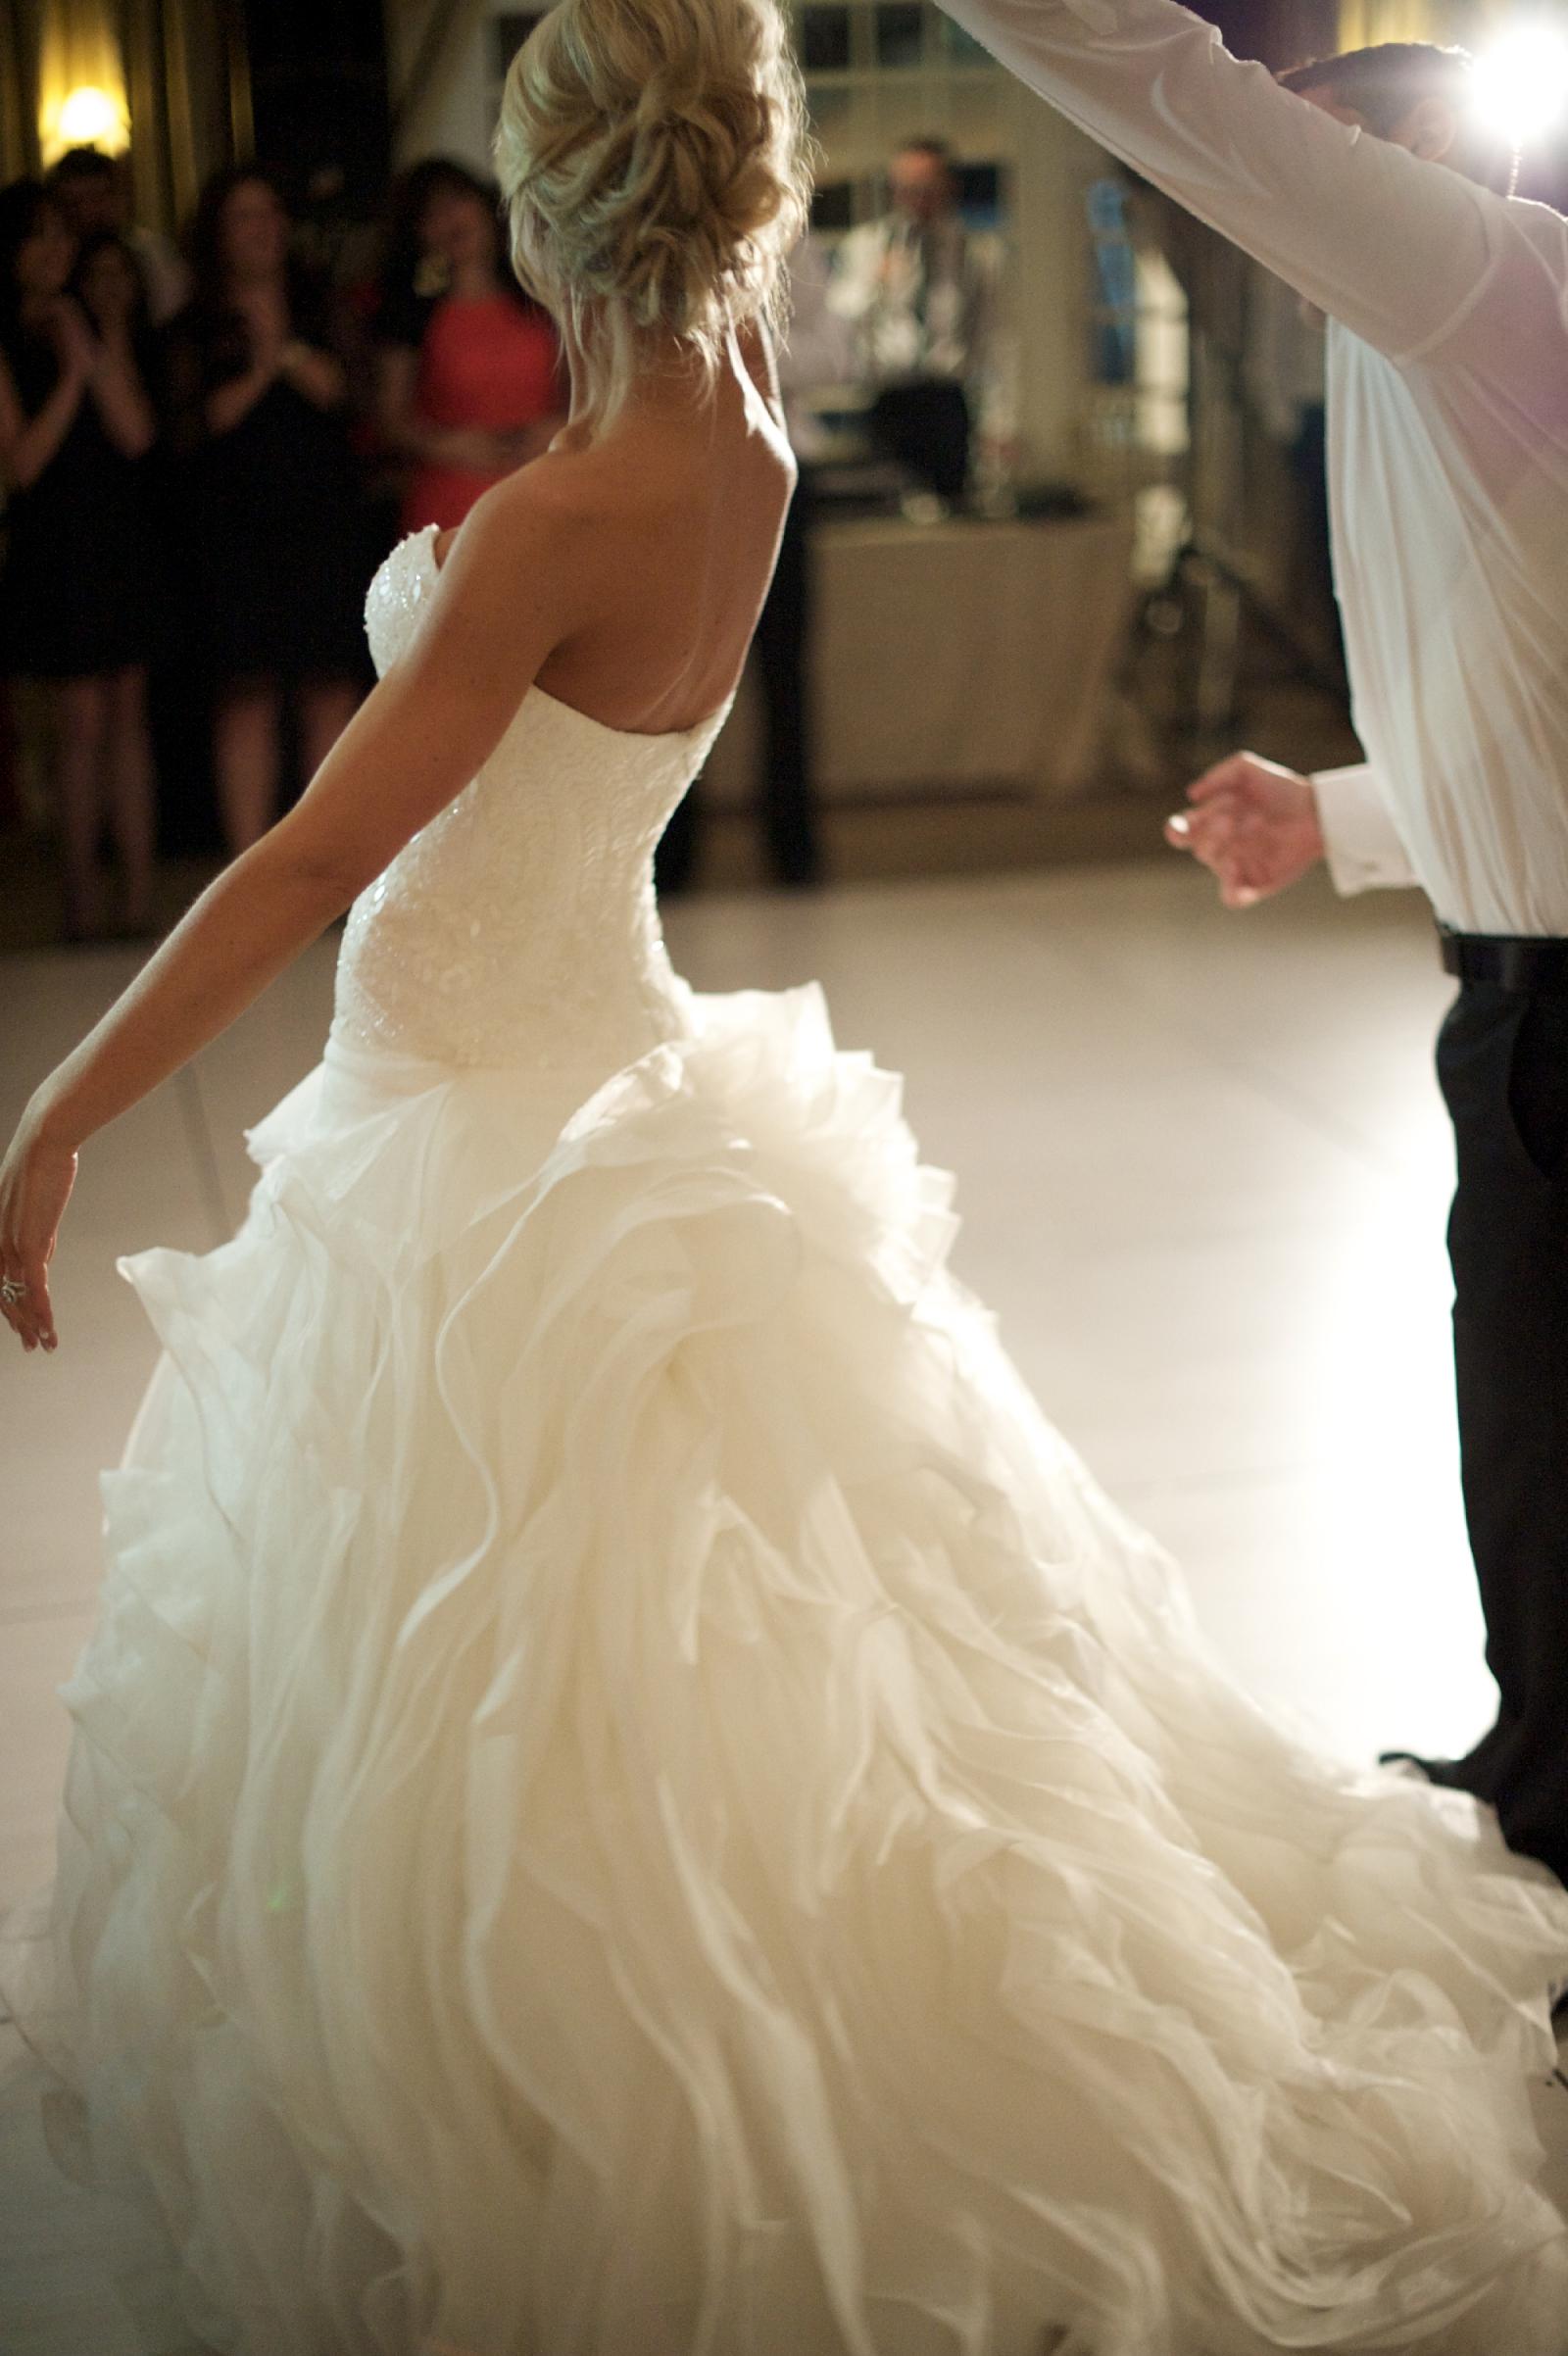 San patrick hannaly second hand wedding dress on sale 42 off for Second hand wedding dresses san diego